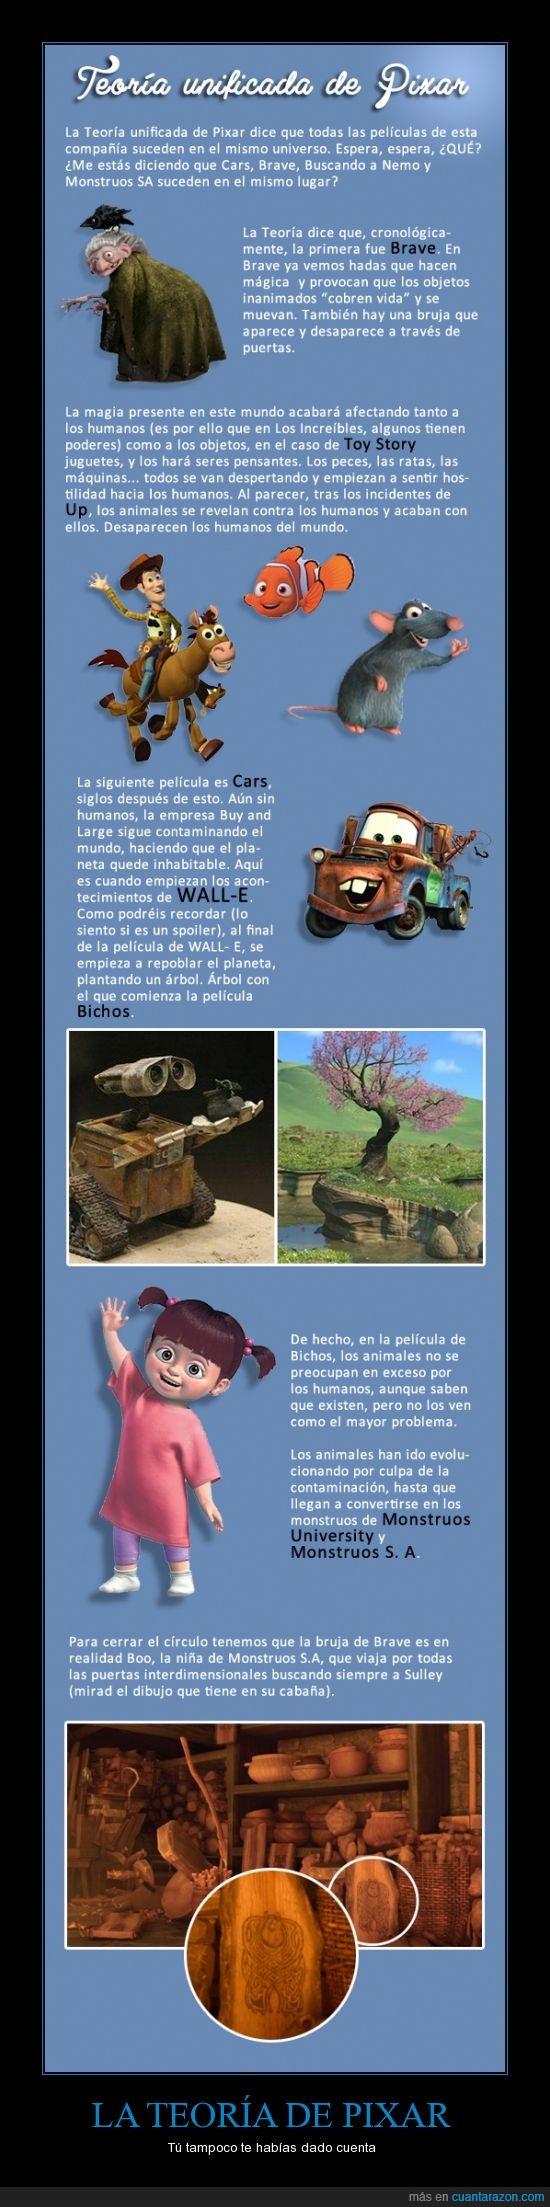 bichos,brave,cars,pixer,teoria,toy story,universo,up